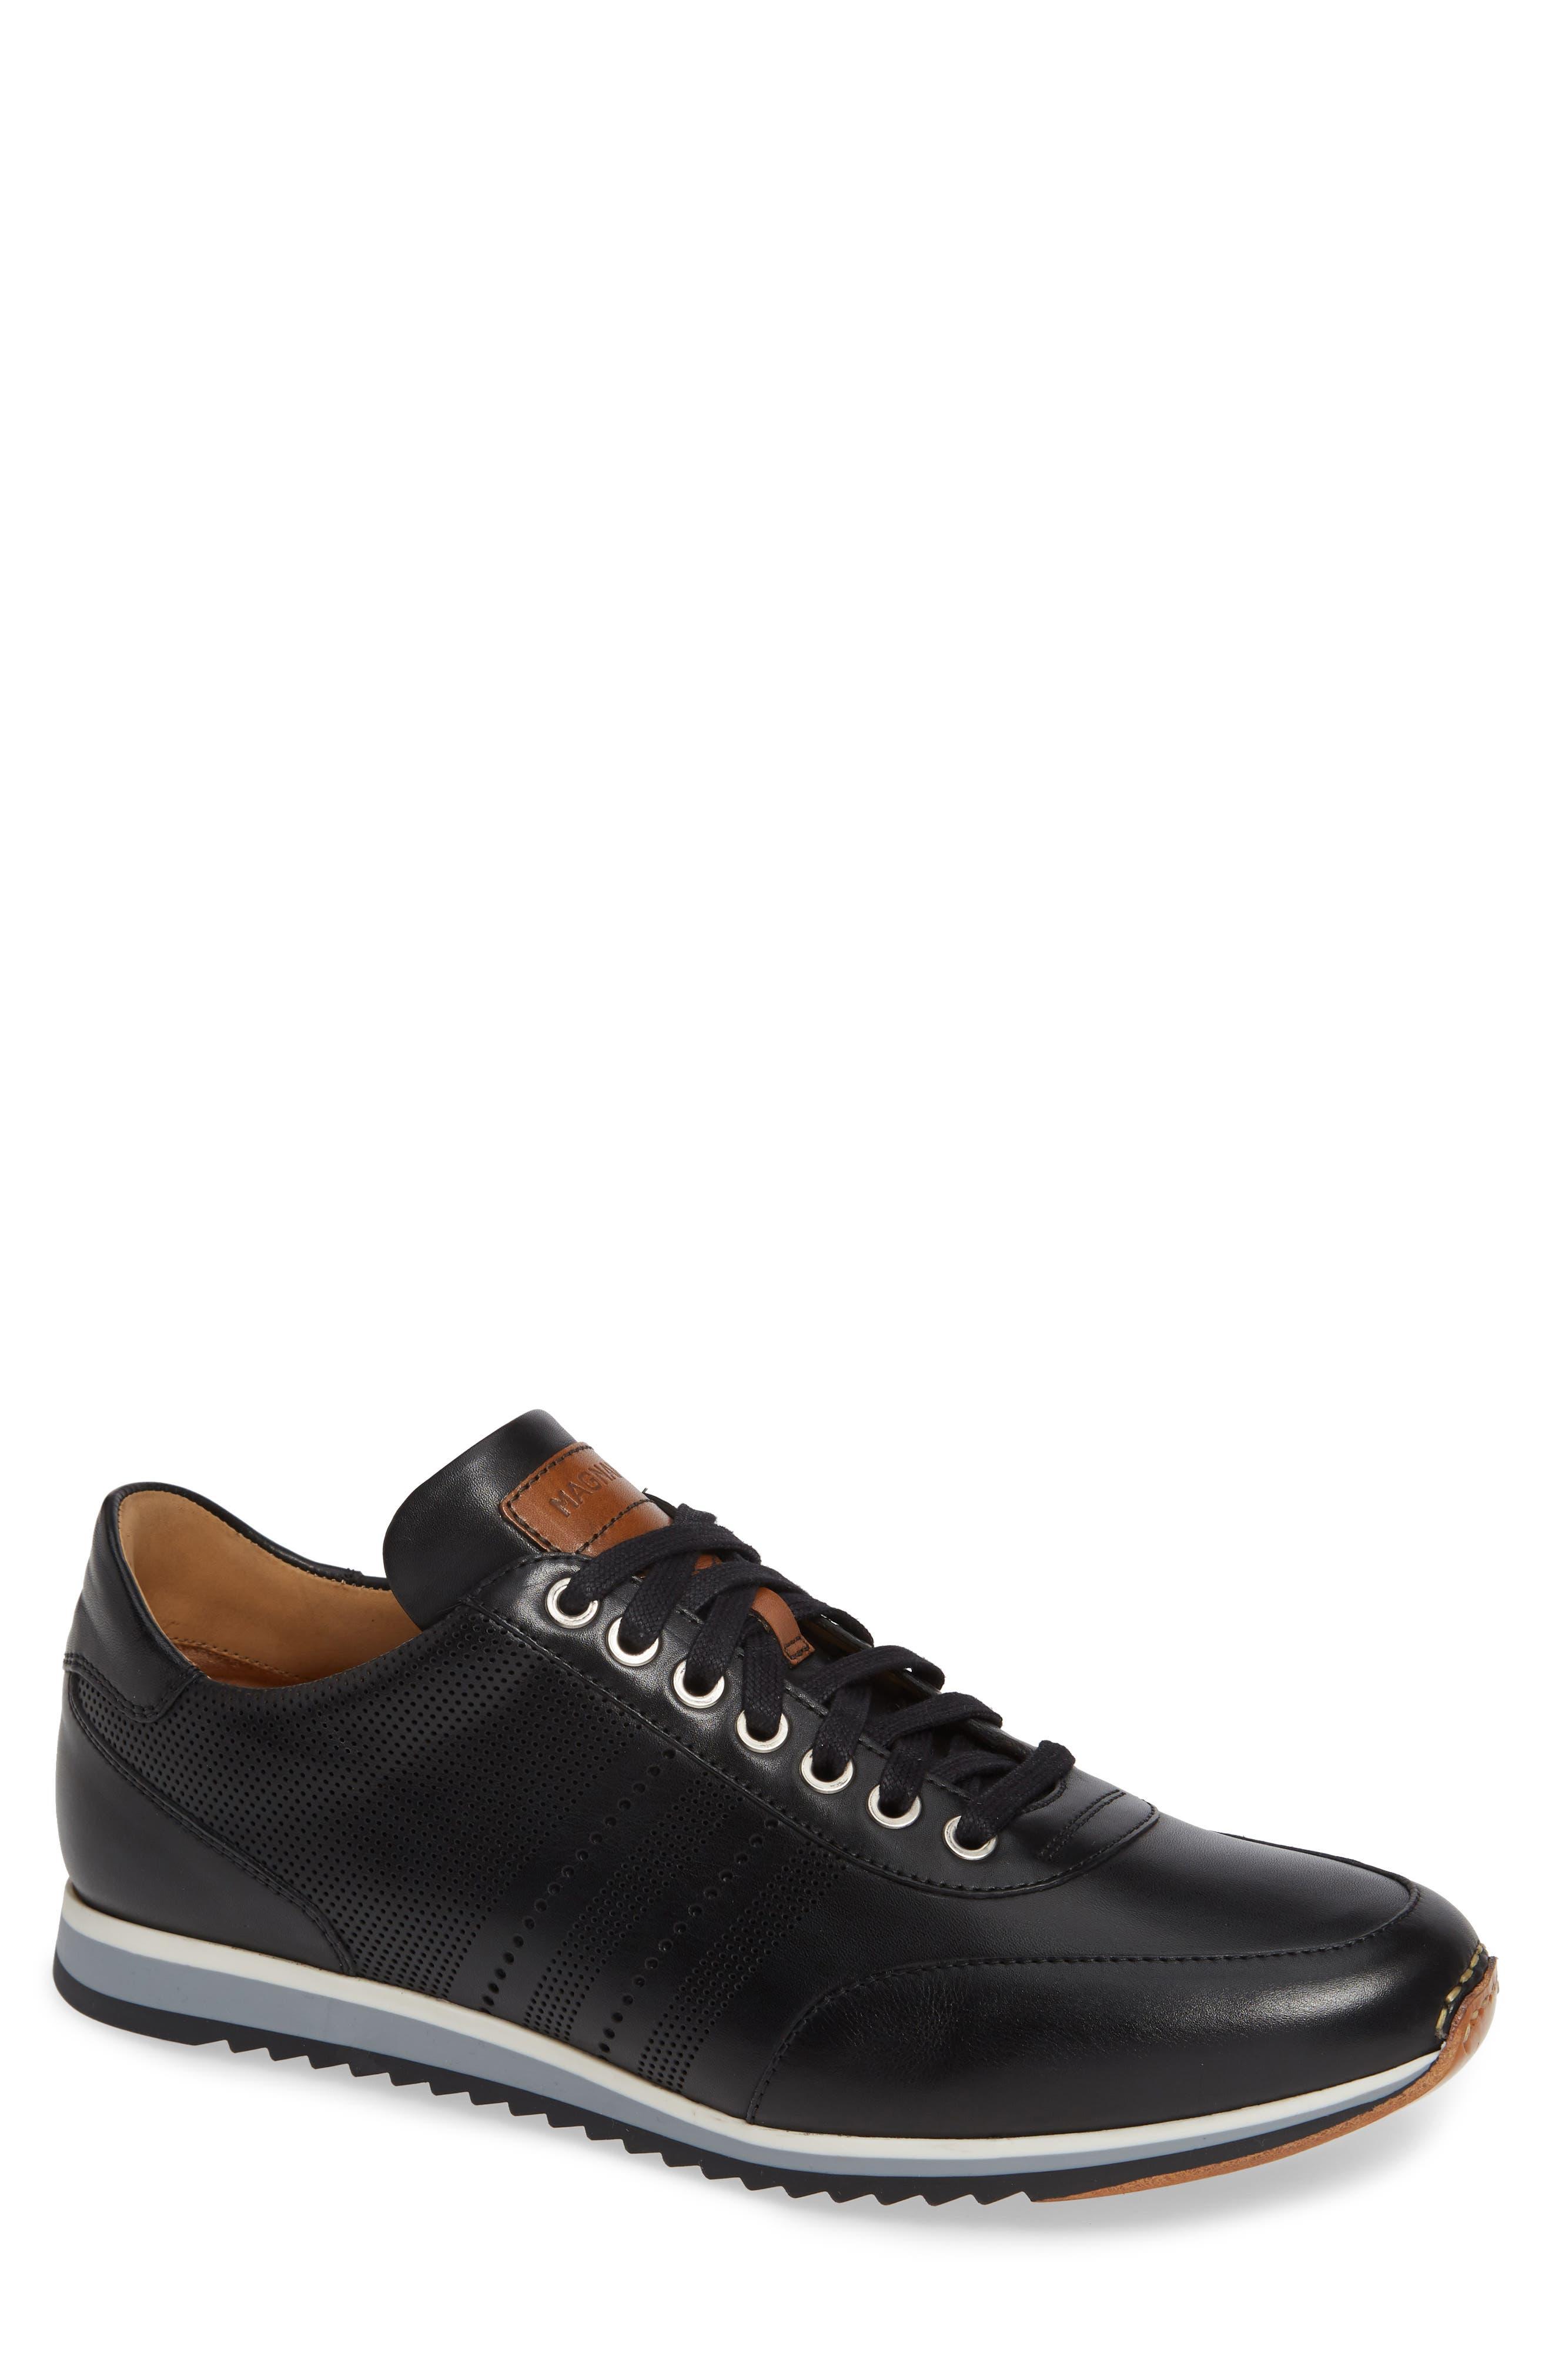 Merino Sneaker,                         Main,                         color, BLACK LEATHER